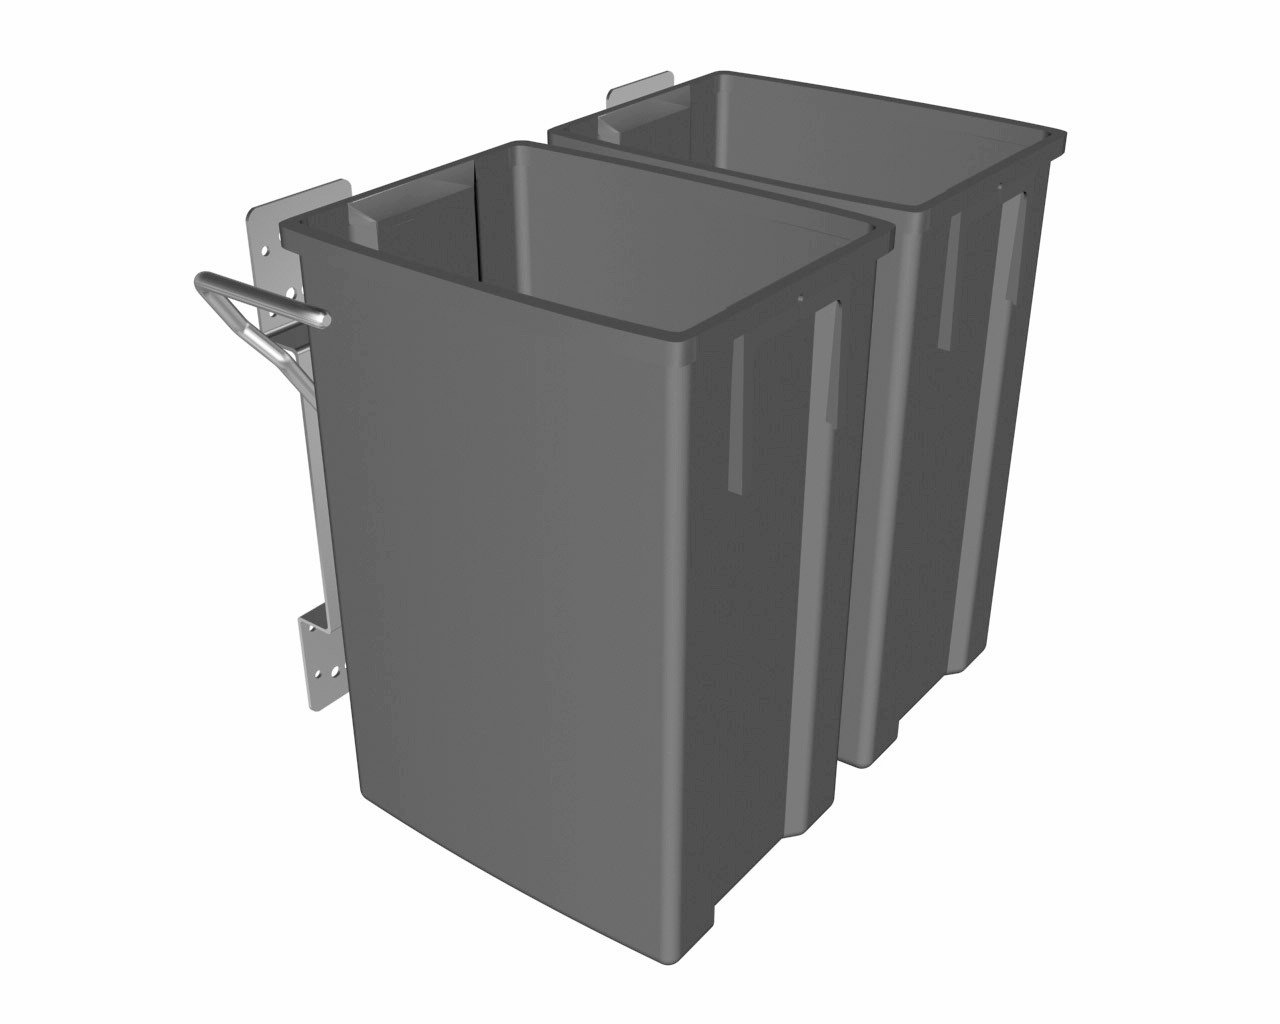 Epoq affaldsspande E11000500307 - Køkkenindretning - Elgiganten